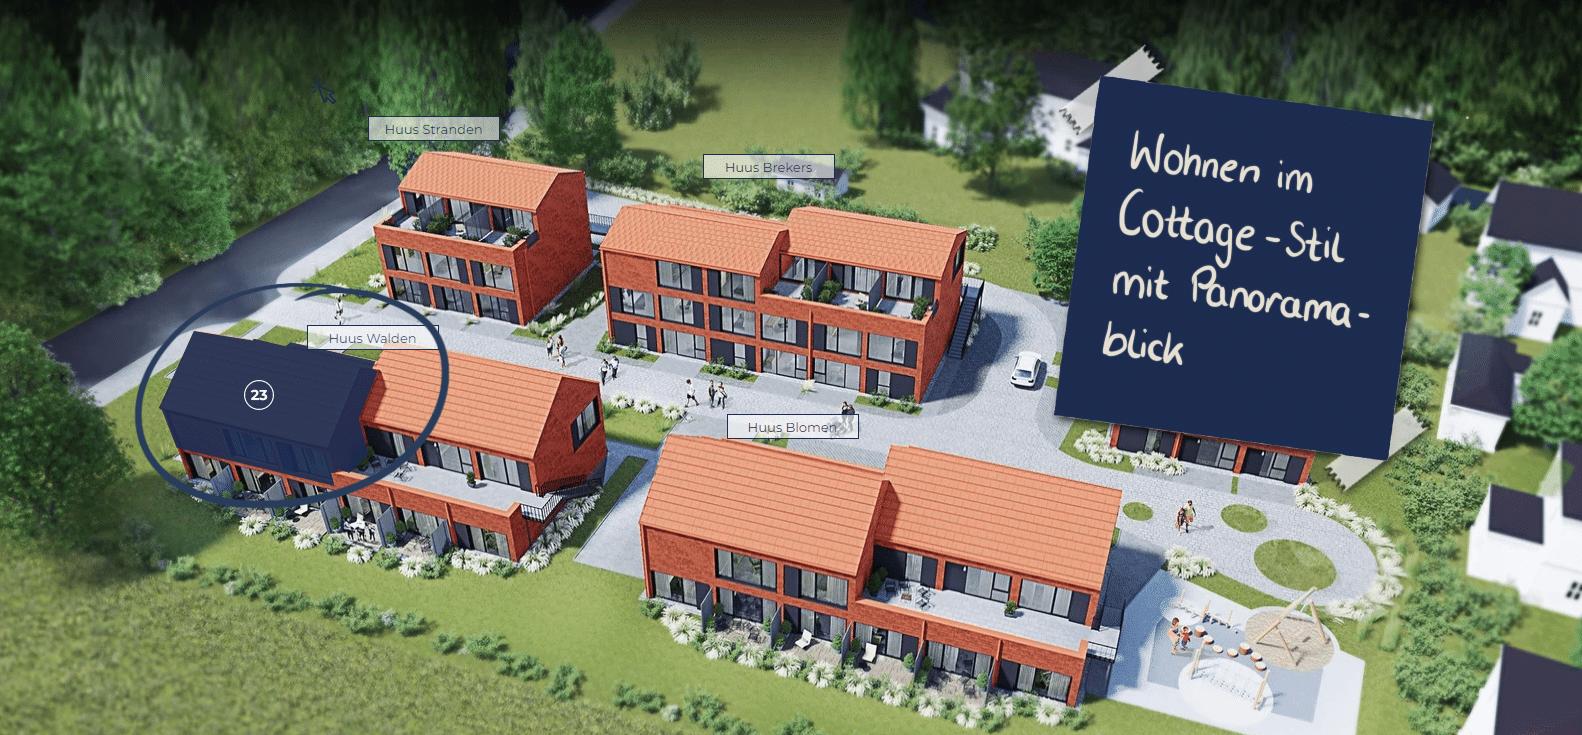 23_De ole School - Ostseeurlaub Ferienapartments Hohwacht Nähe Heiligenhafen Lütjenburg Kieler Bucht